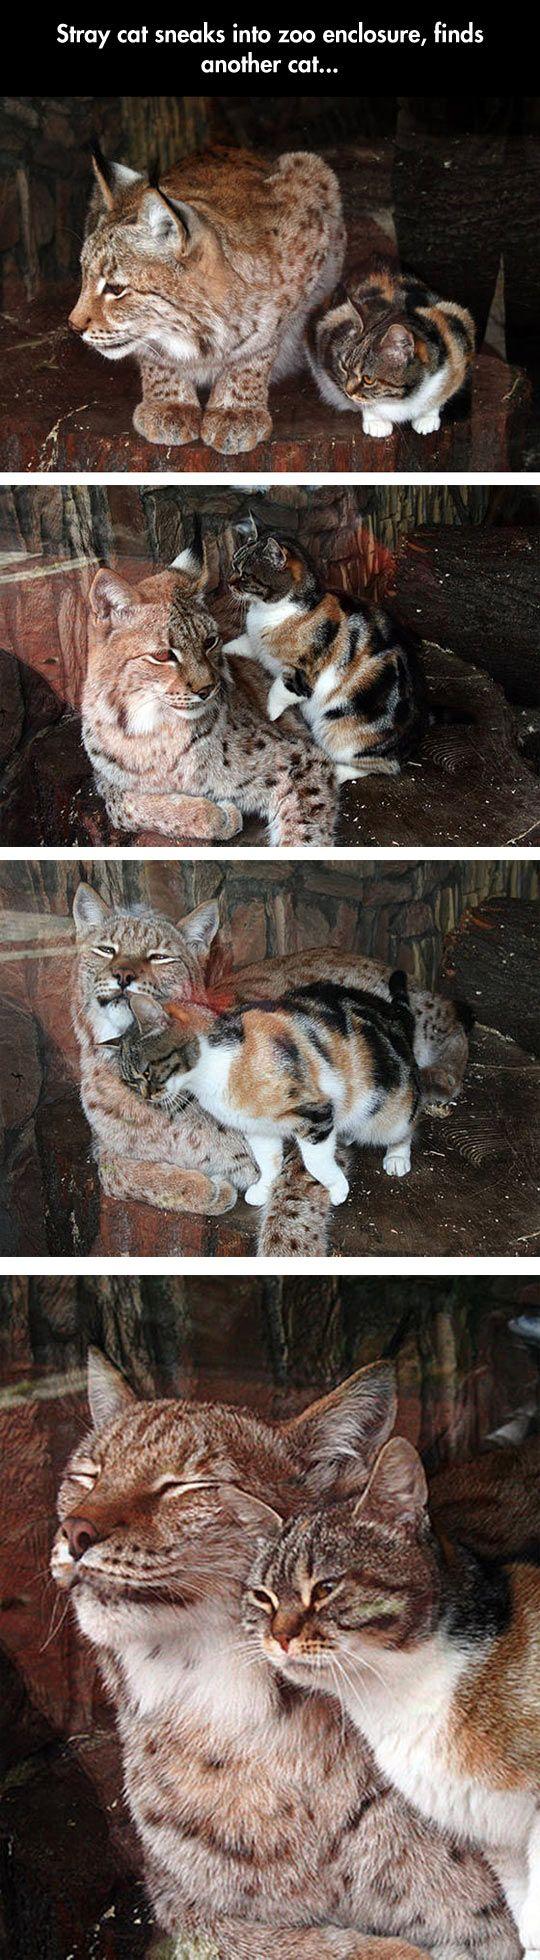 cat - feline - zoo